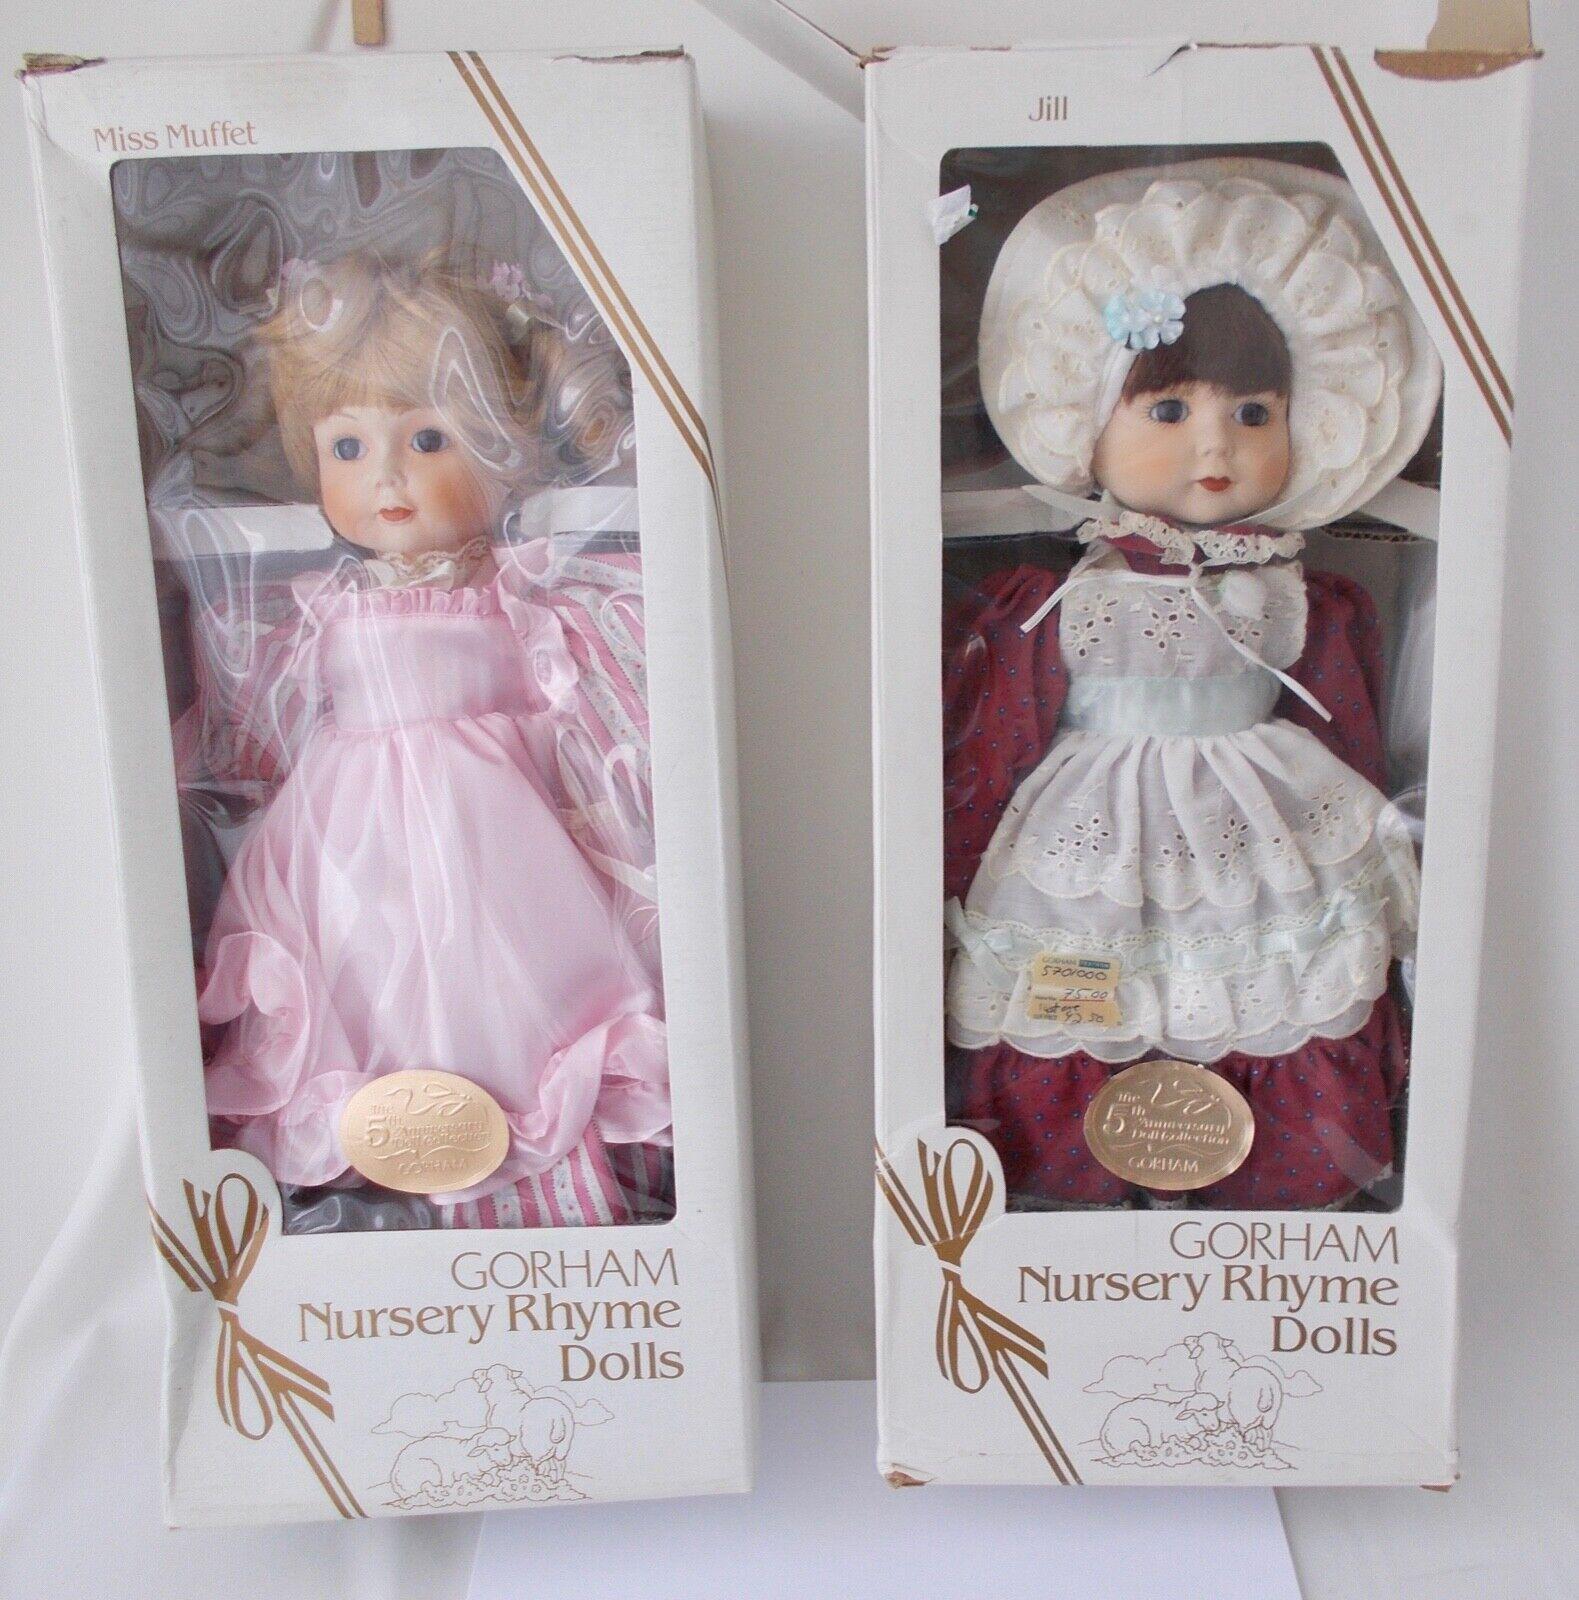 2 GORHAM Nursery Rhyme Musical bambolas   Miss Muffet & JillUnused in scatolaes  basso prezzo del 40%